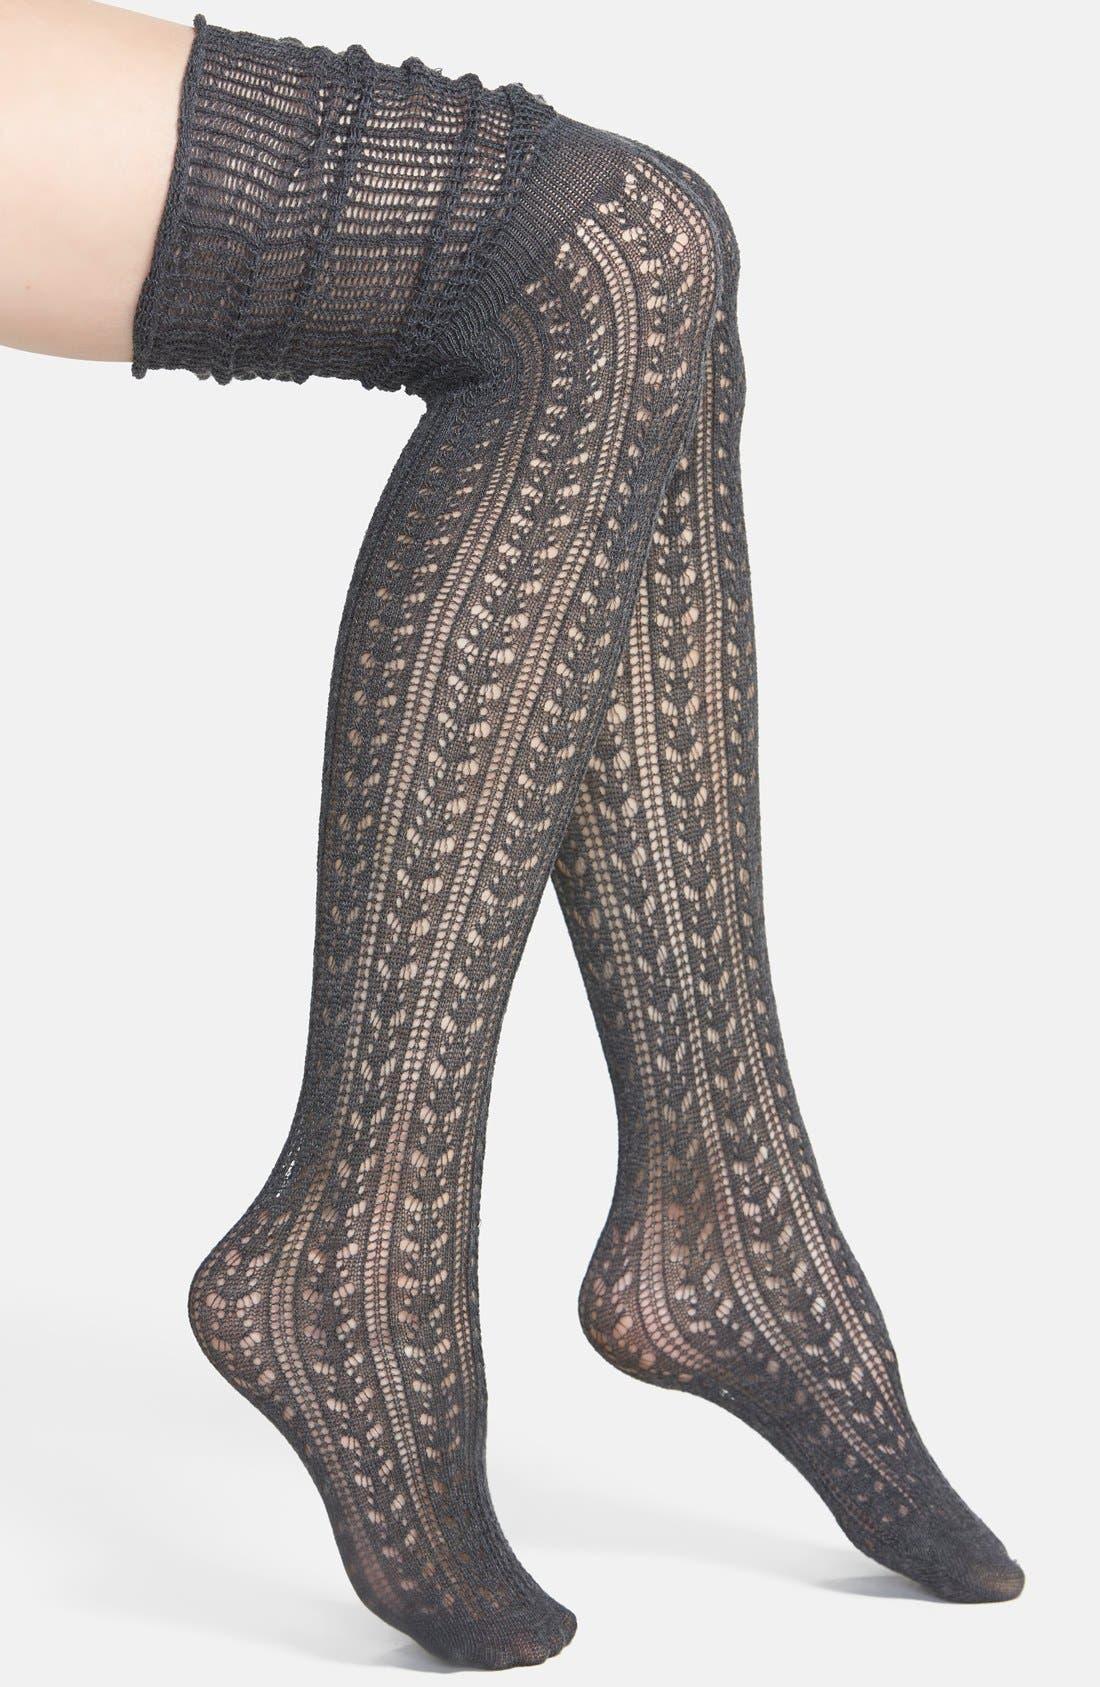 'Bowery' Over The Knee Socks,                             Main thumbnail 1, color,                             055